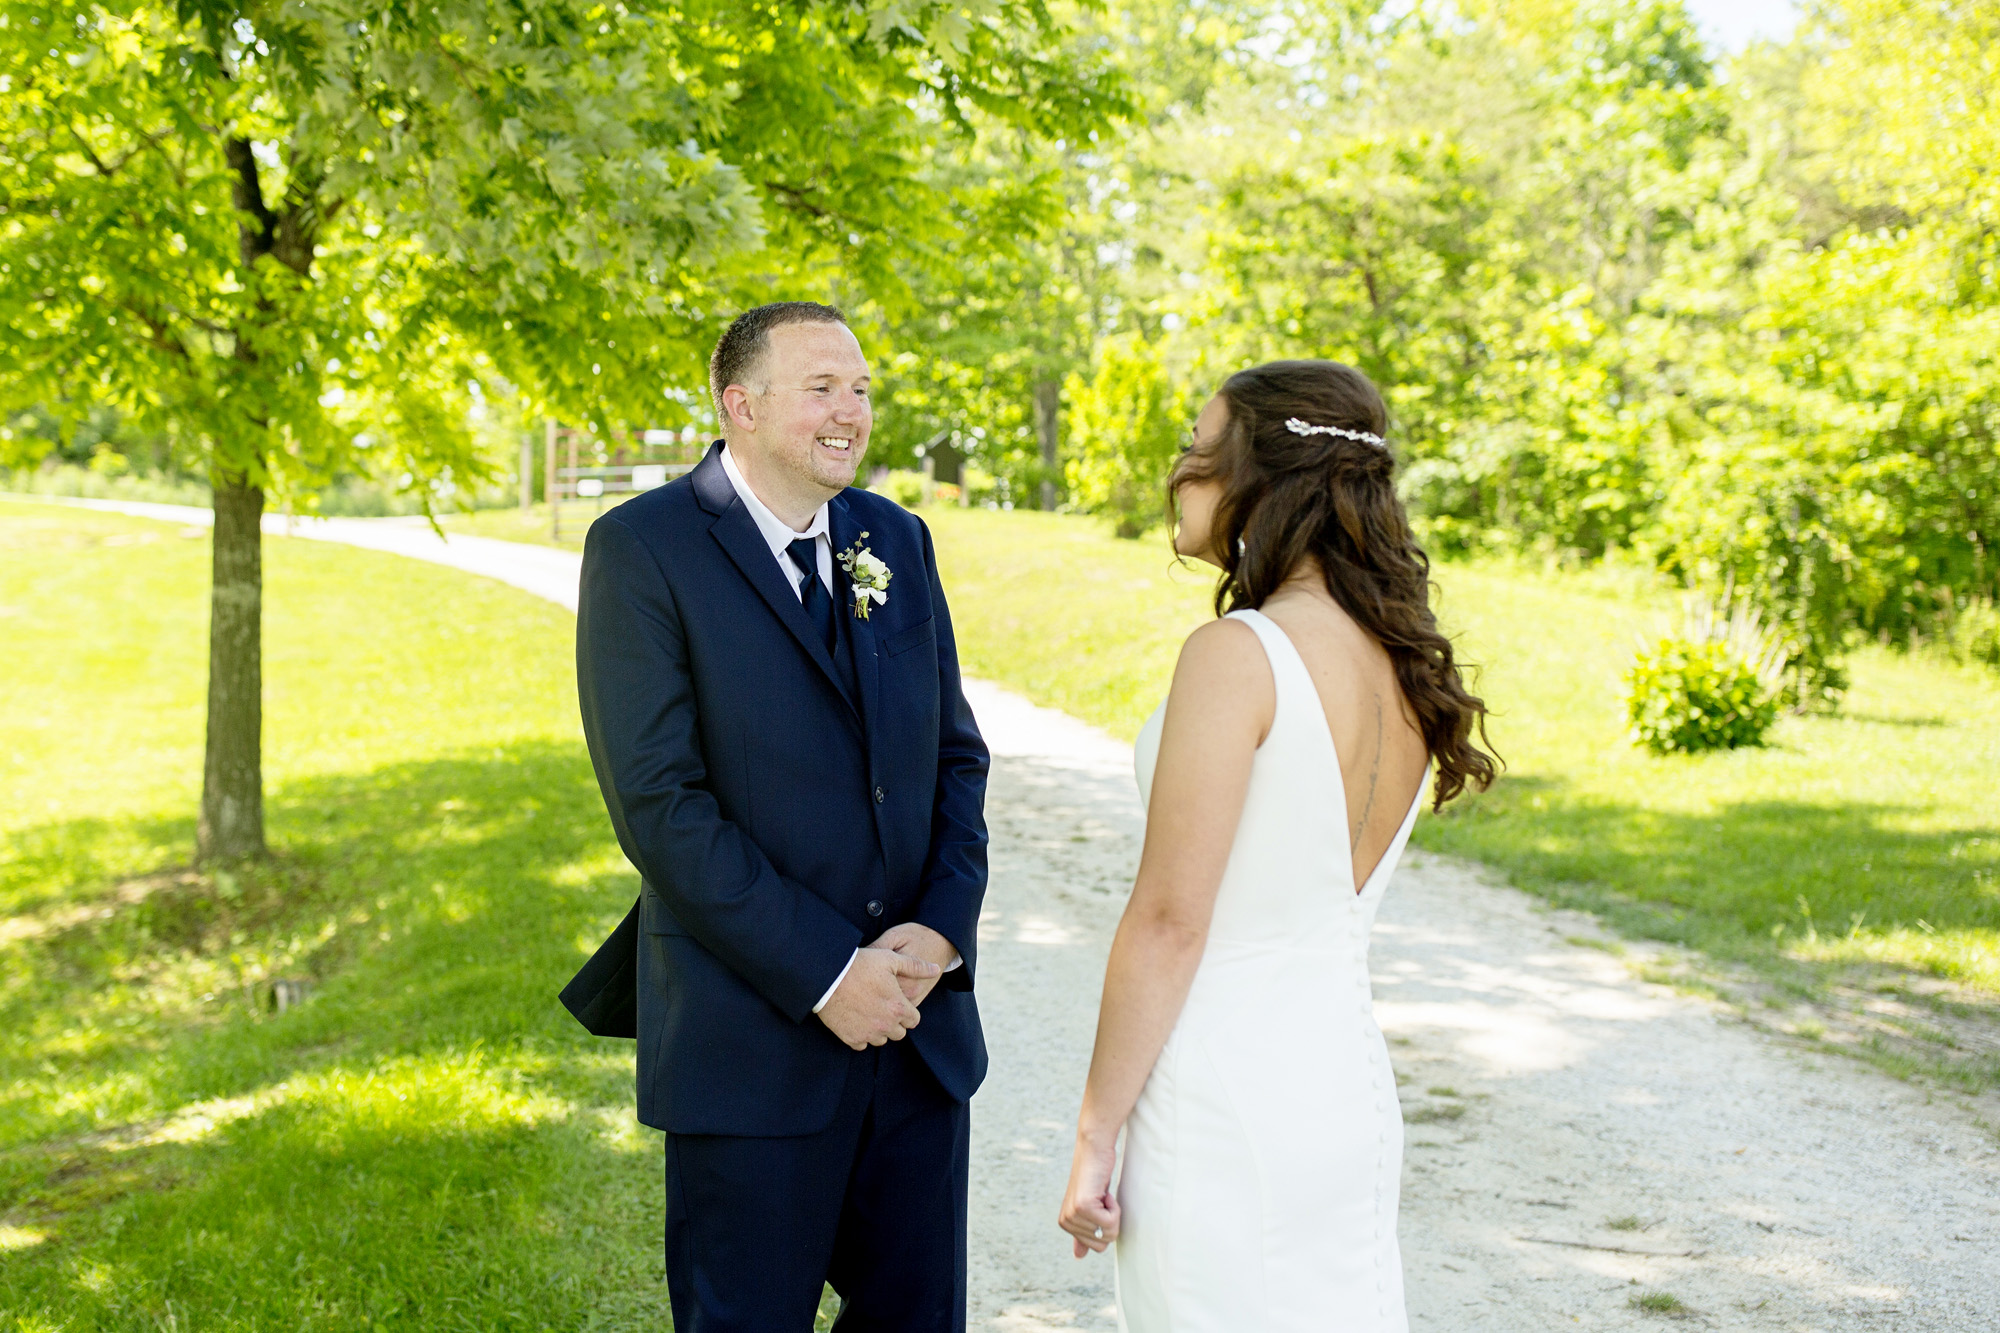 Seriously_Sabrina_Photography_Red_River_Gorge_Wedding_Barn_Robinson31.jpg